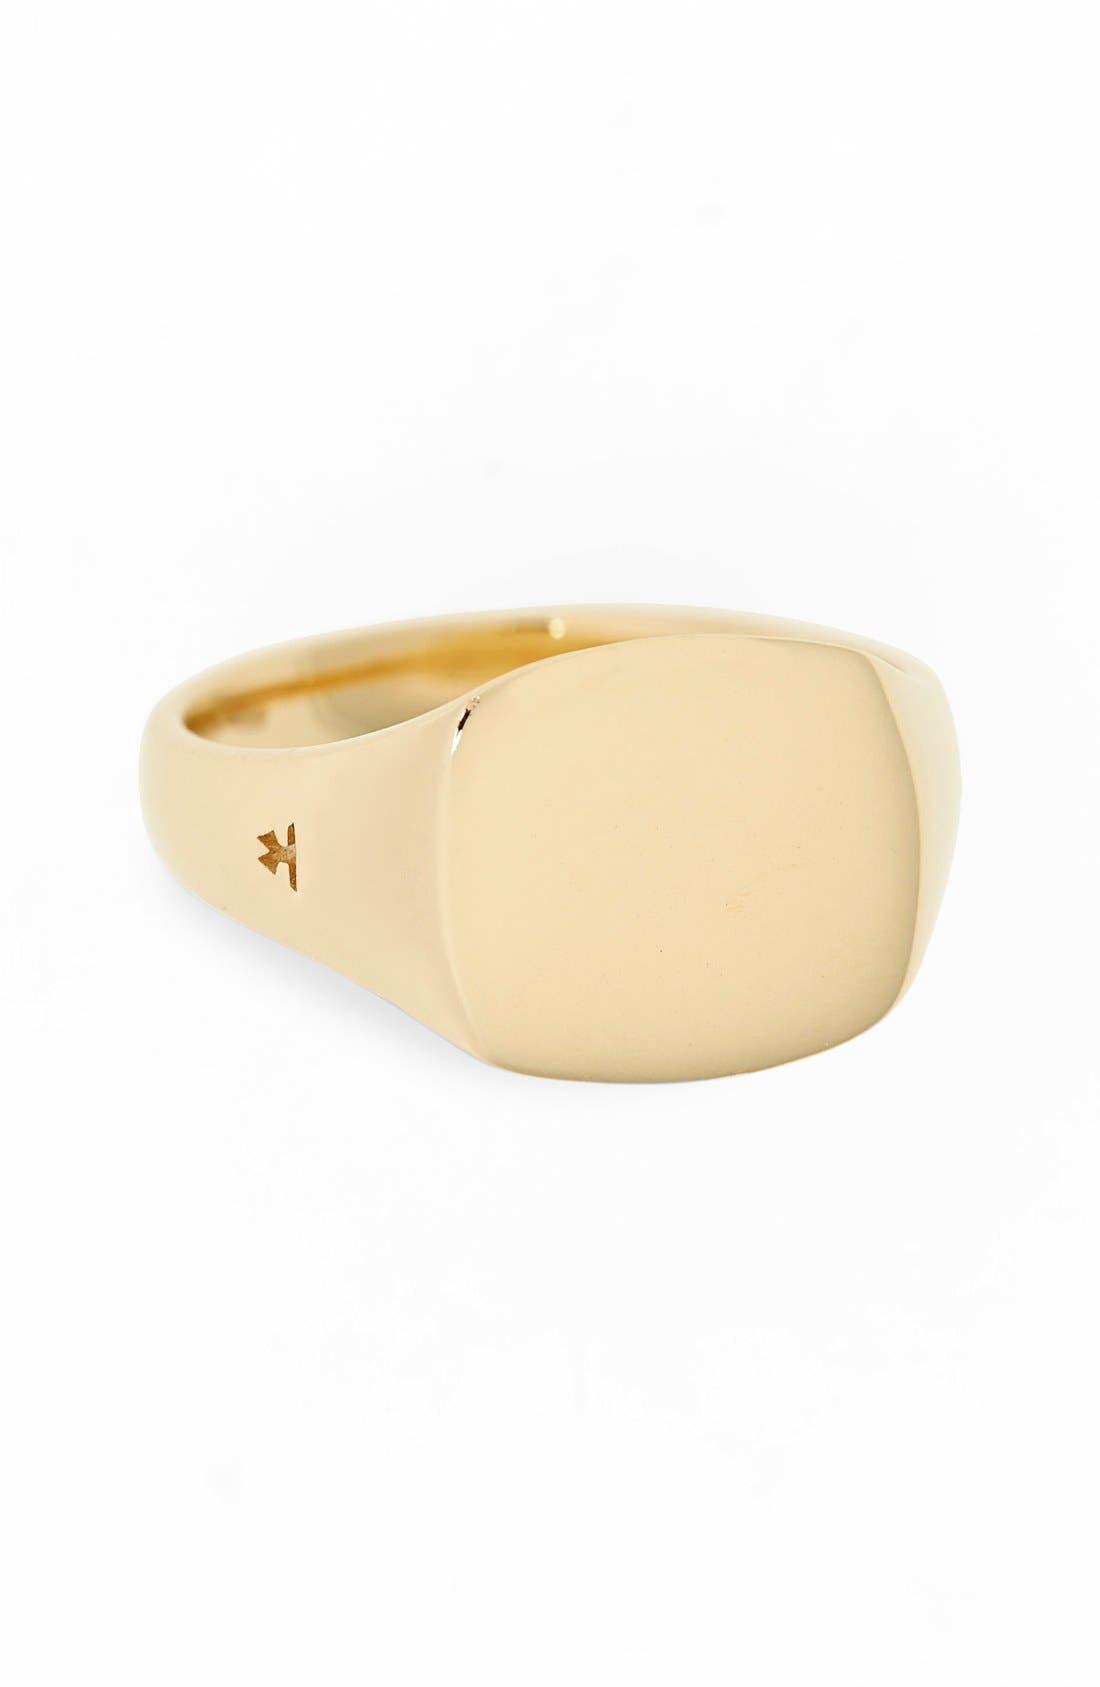 Alternate Image 1 Selected - Tom Wood Mini Gold Cushion Signet Ring